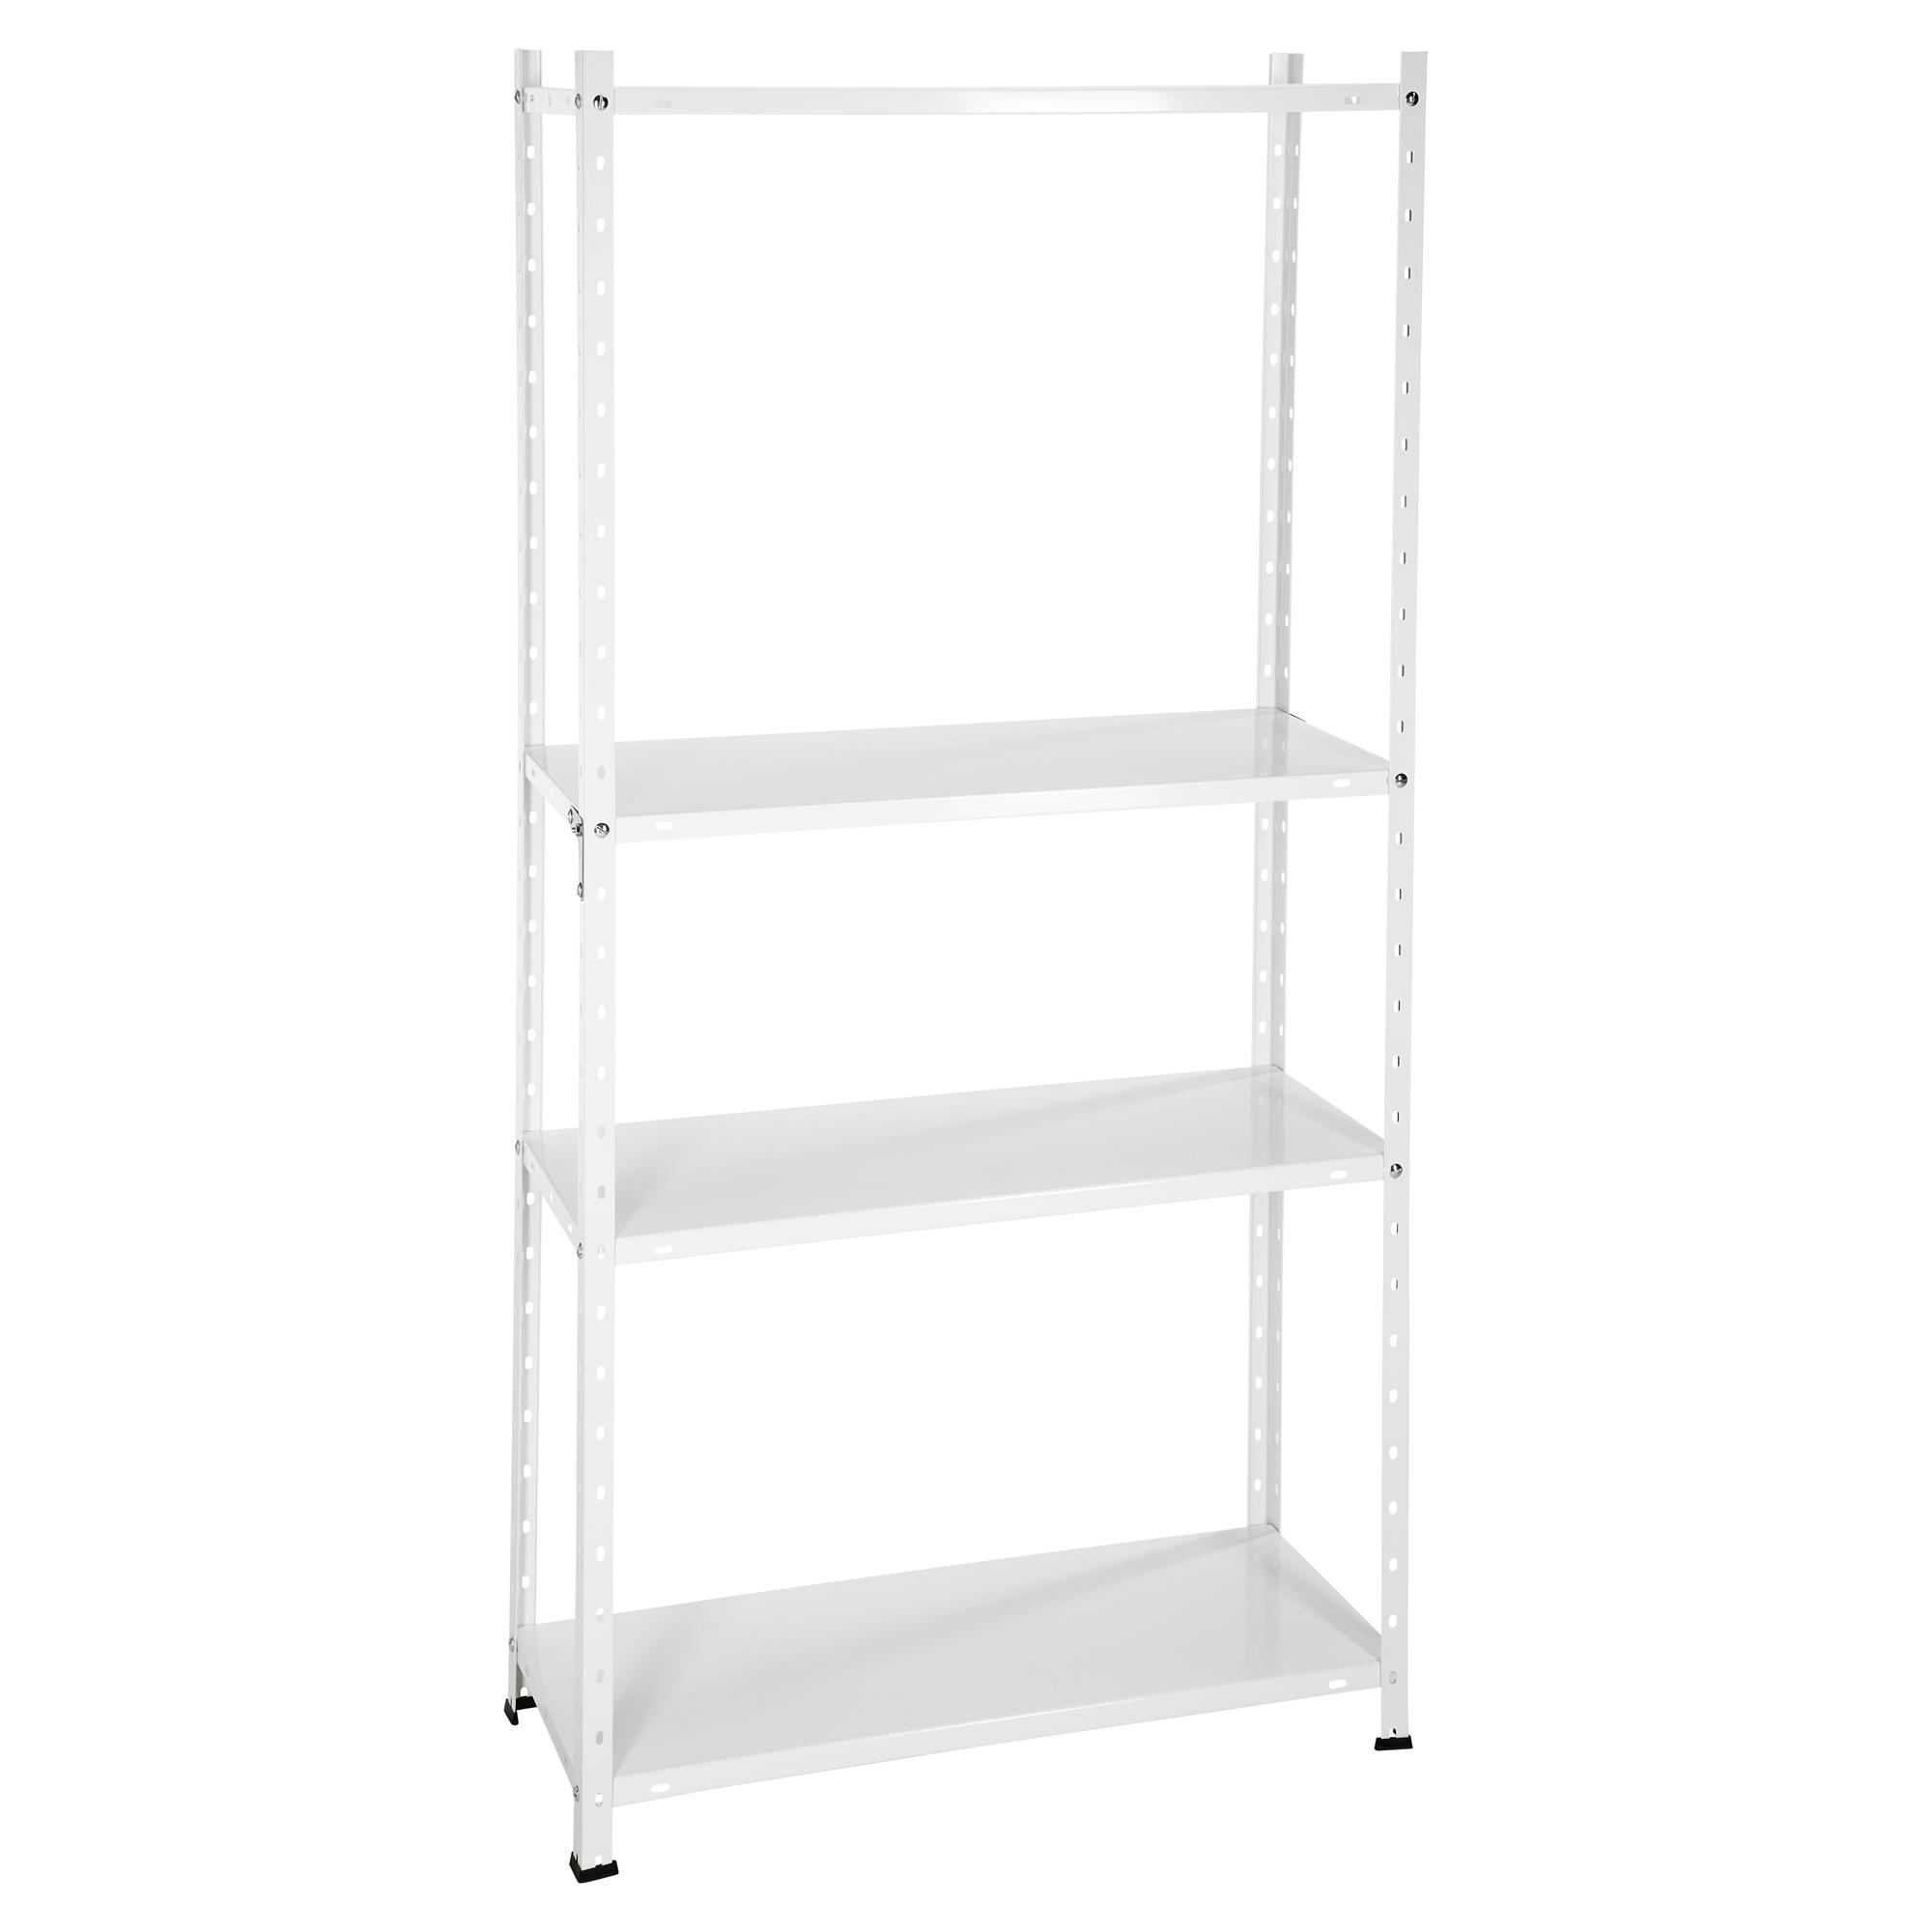 Metallregal weiß  Metallregal weiß 150 x 75 x 30 cm ǀ toom Baumarkt